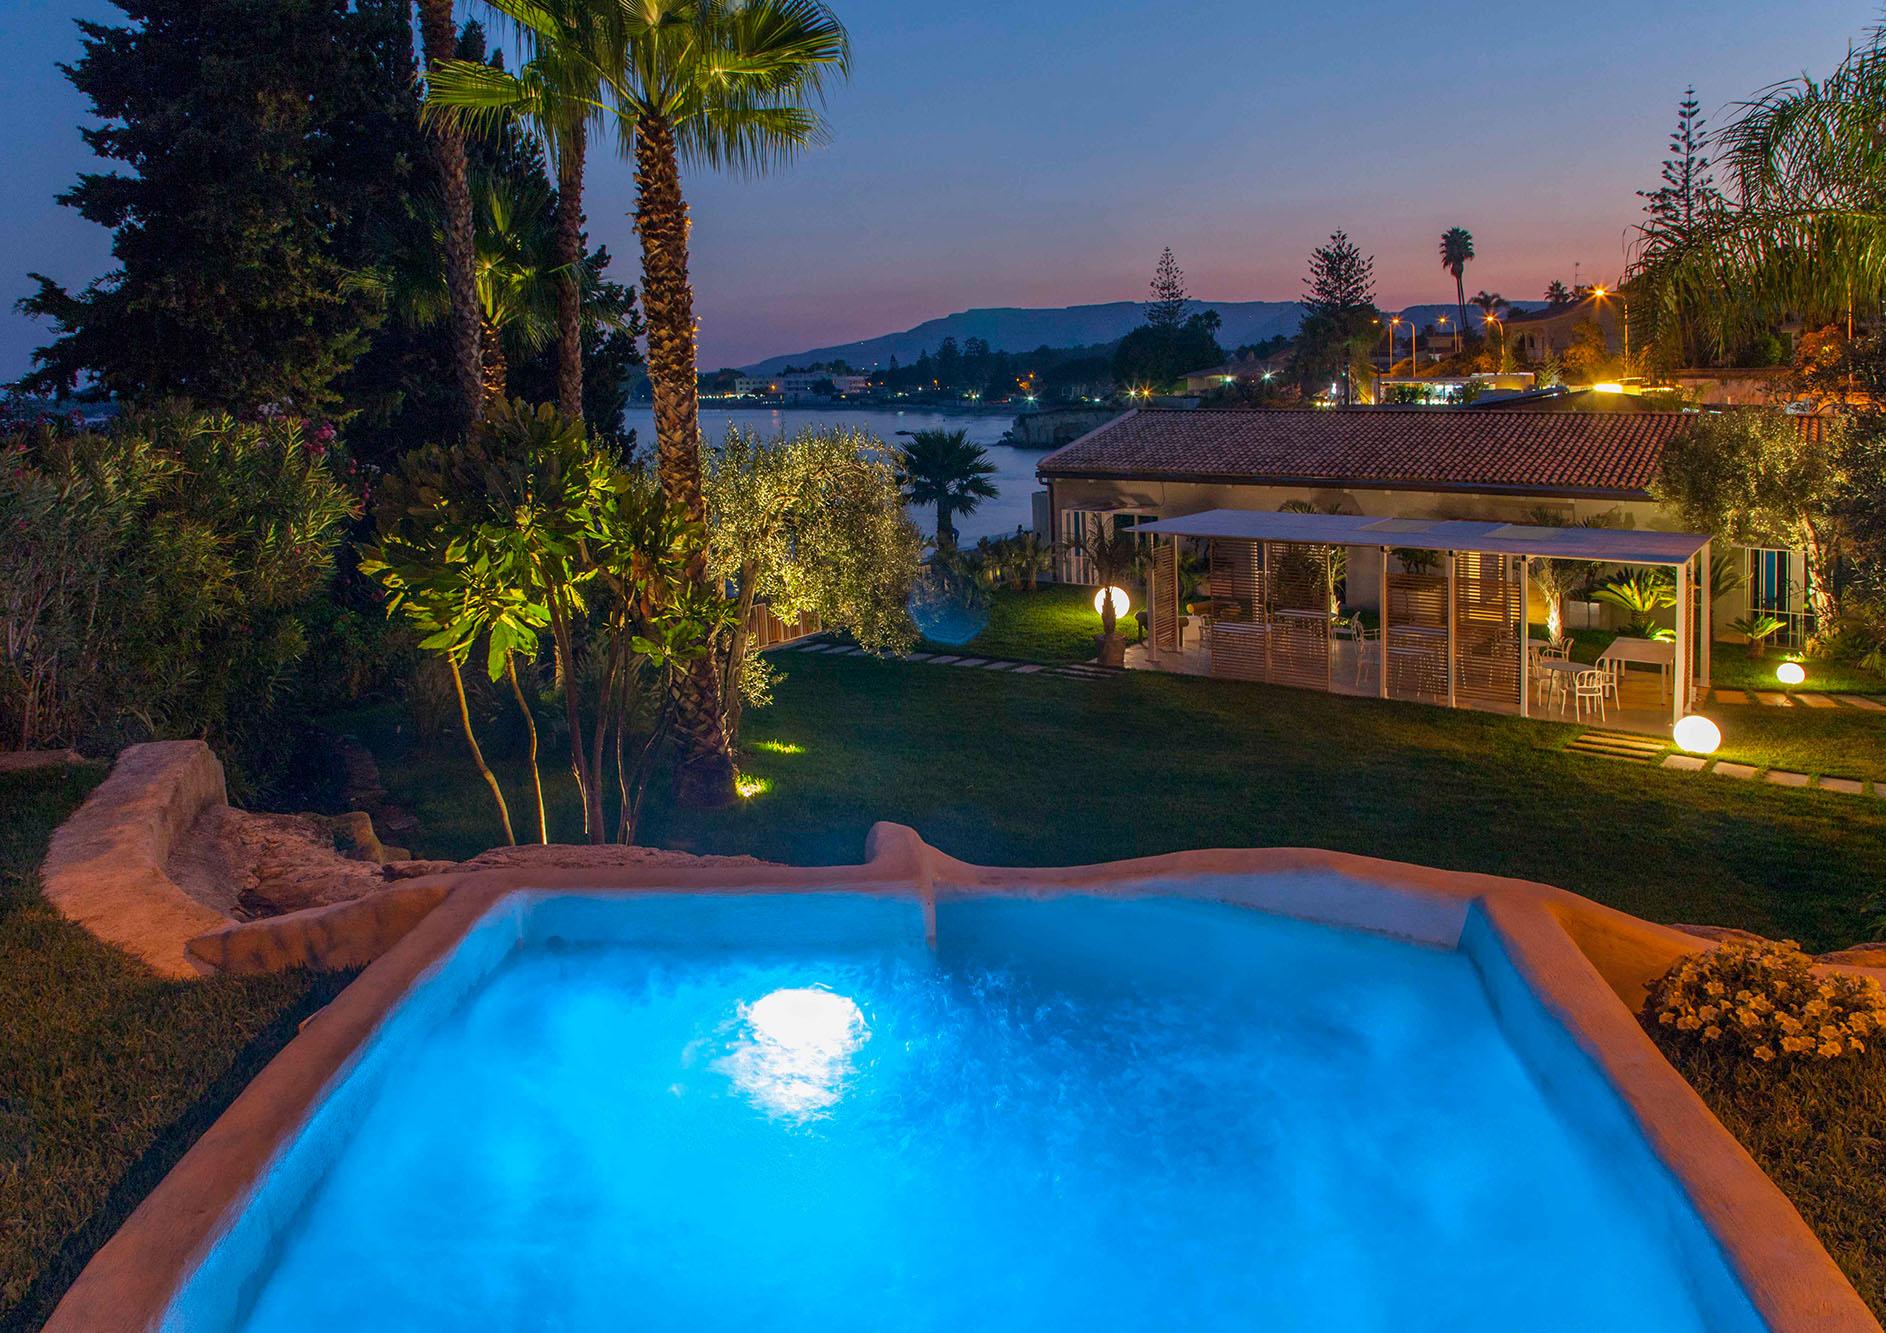 calapetra-resort-fontane-bianche-siracusa-3